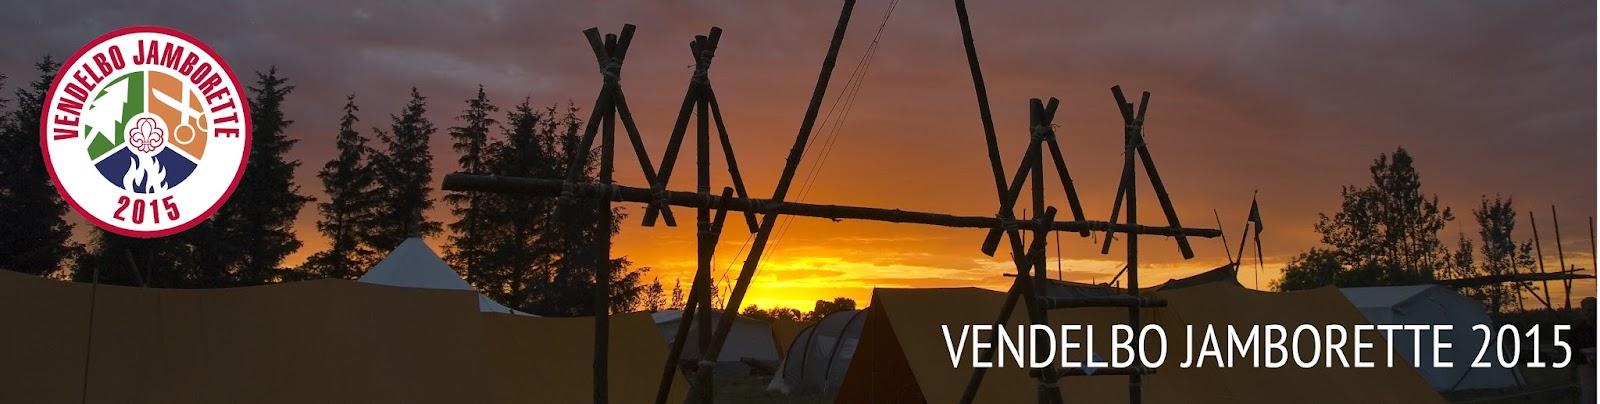 VENDELBO JAMBORETTE 2015